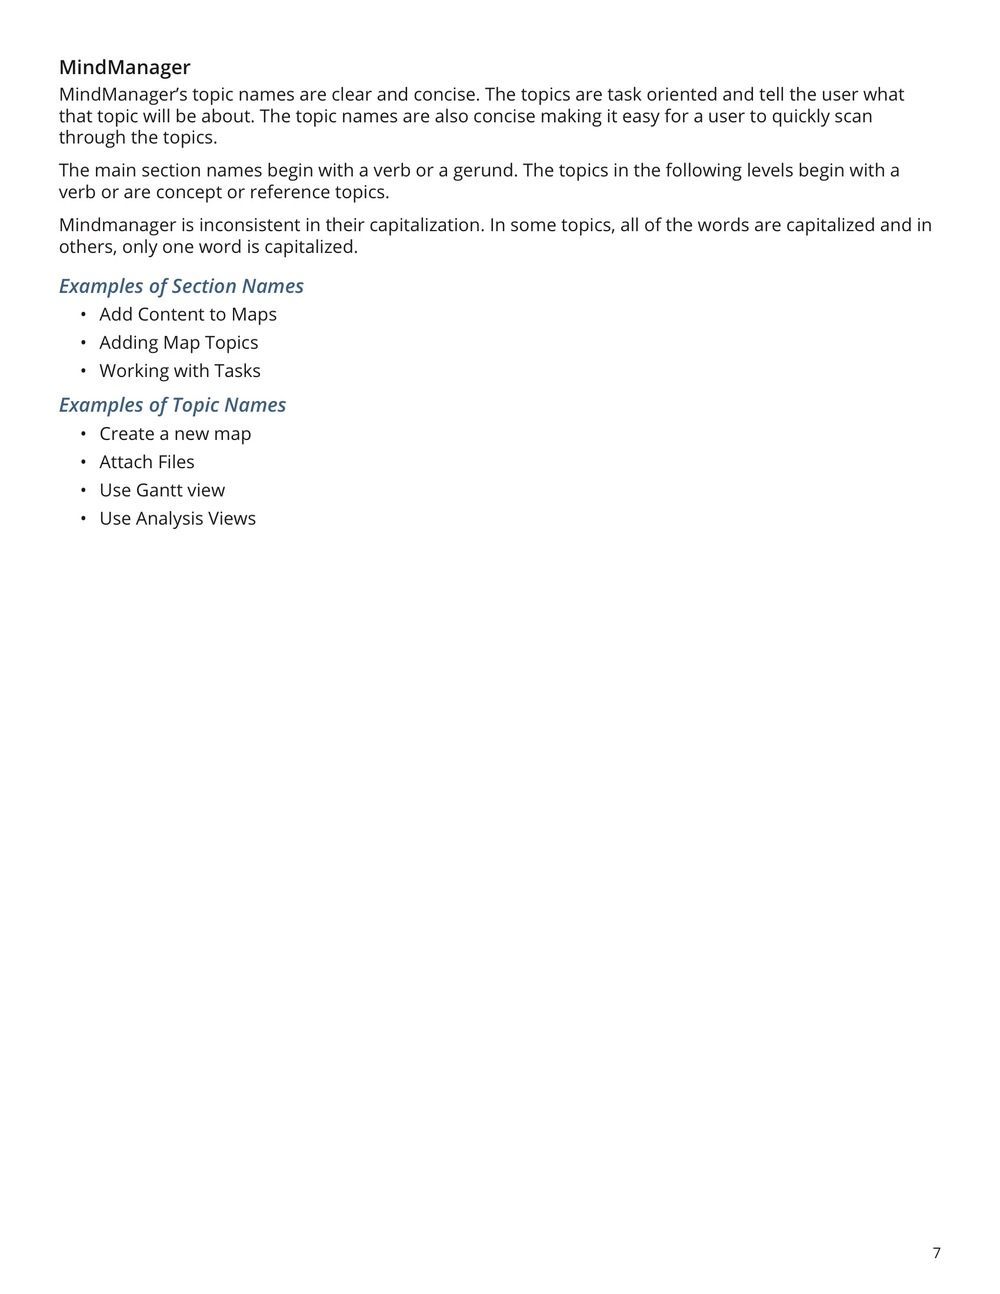 XMind Final Report_4-23-15 7-7.jpeg